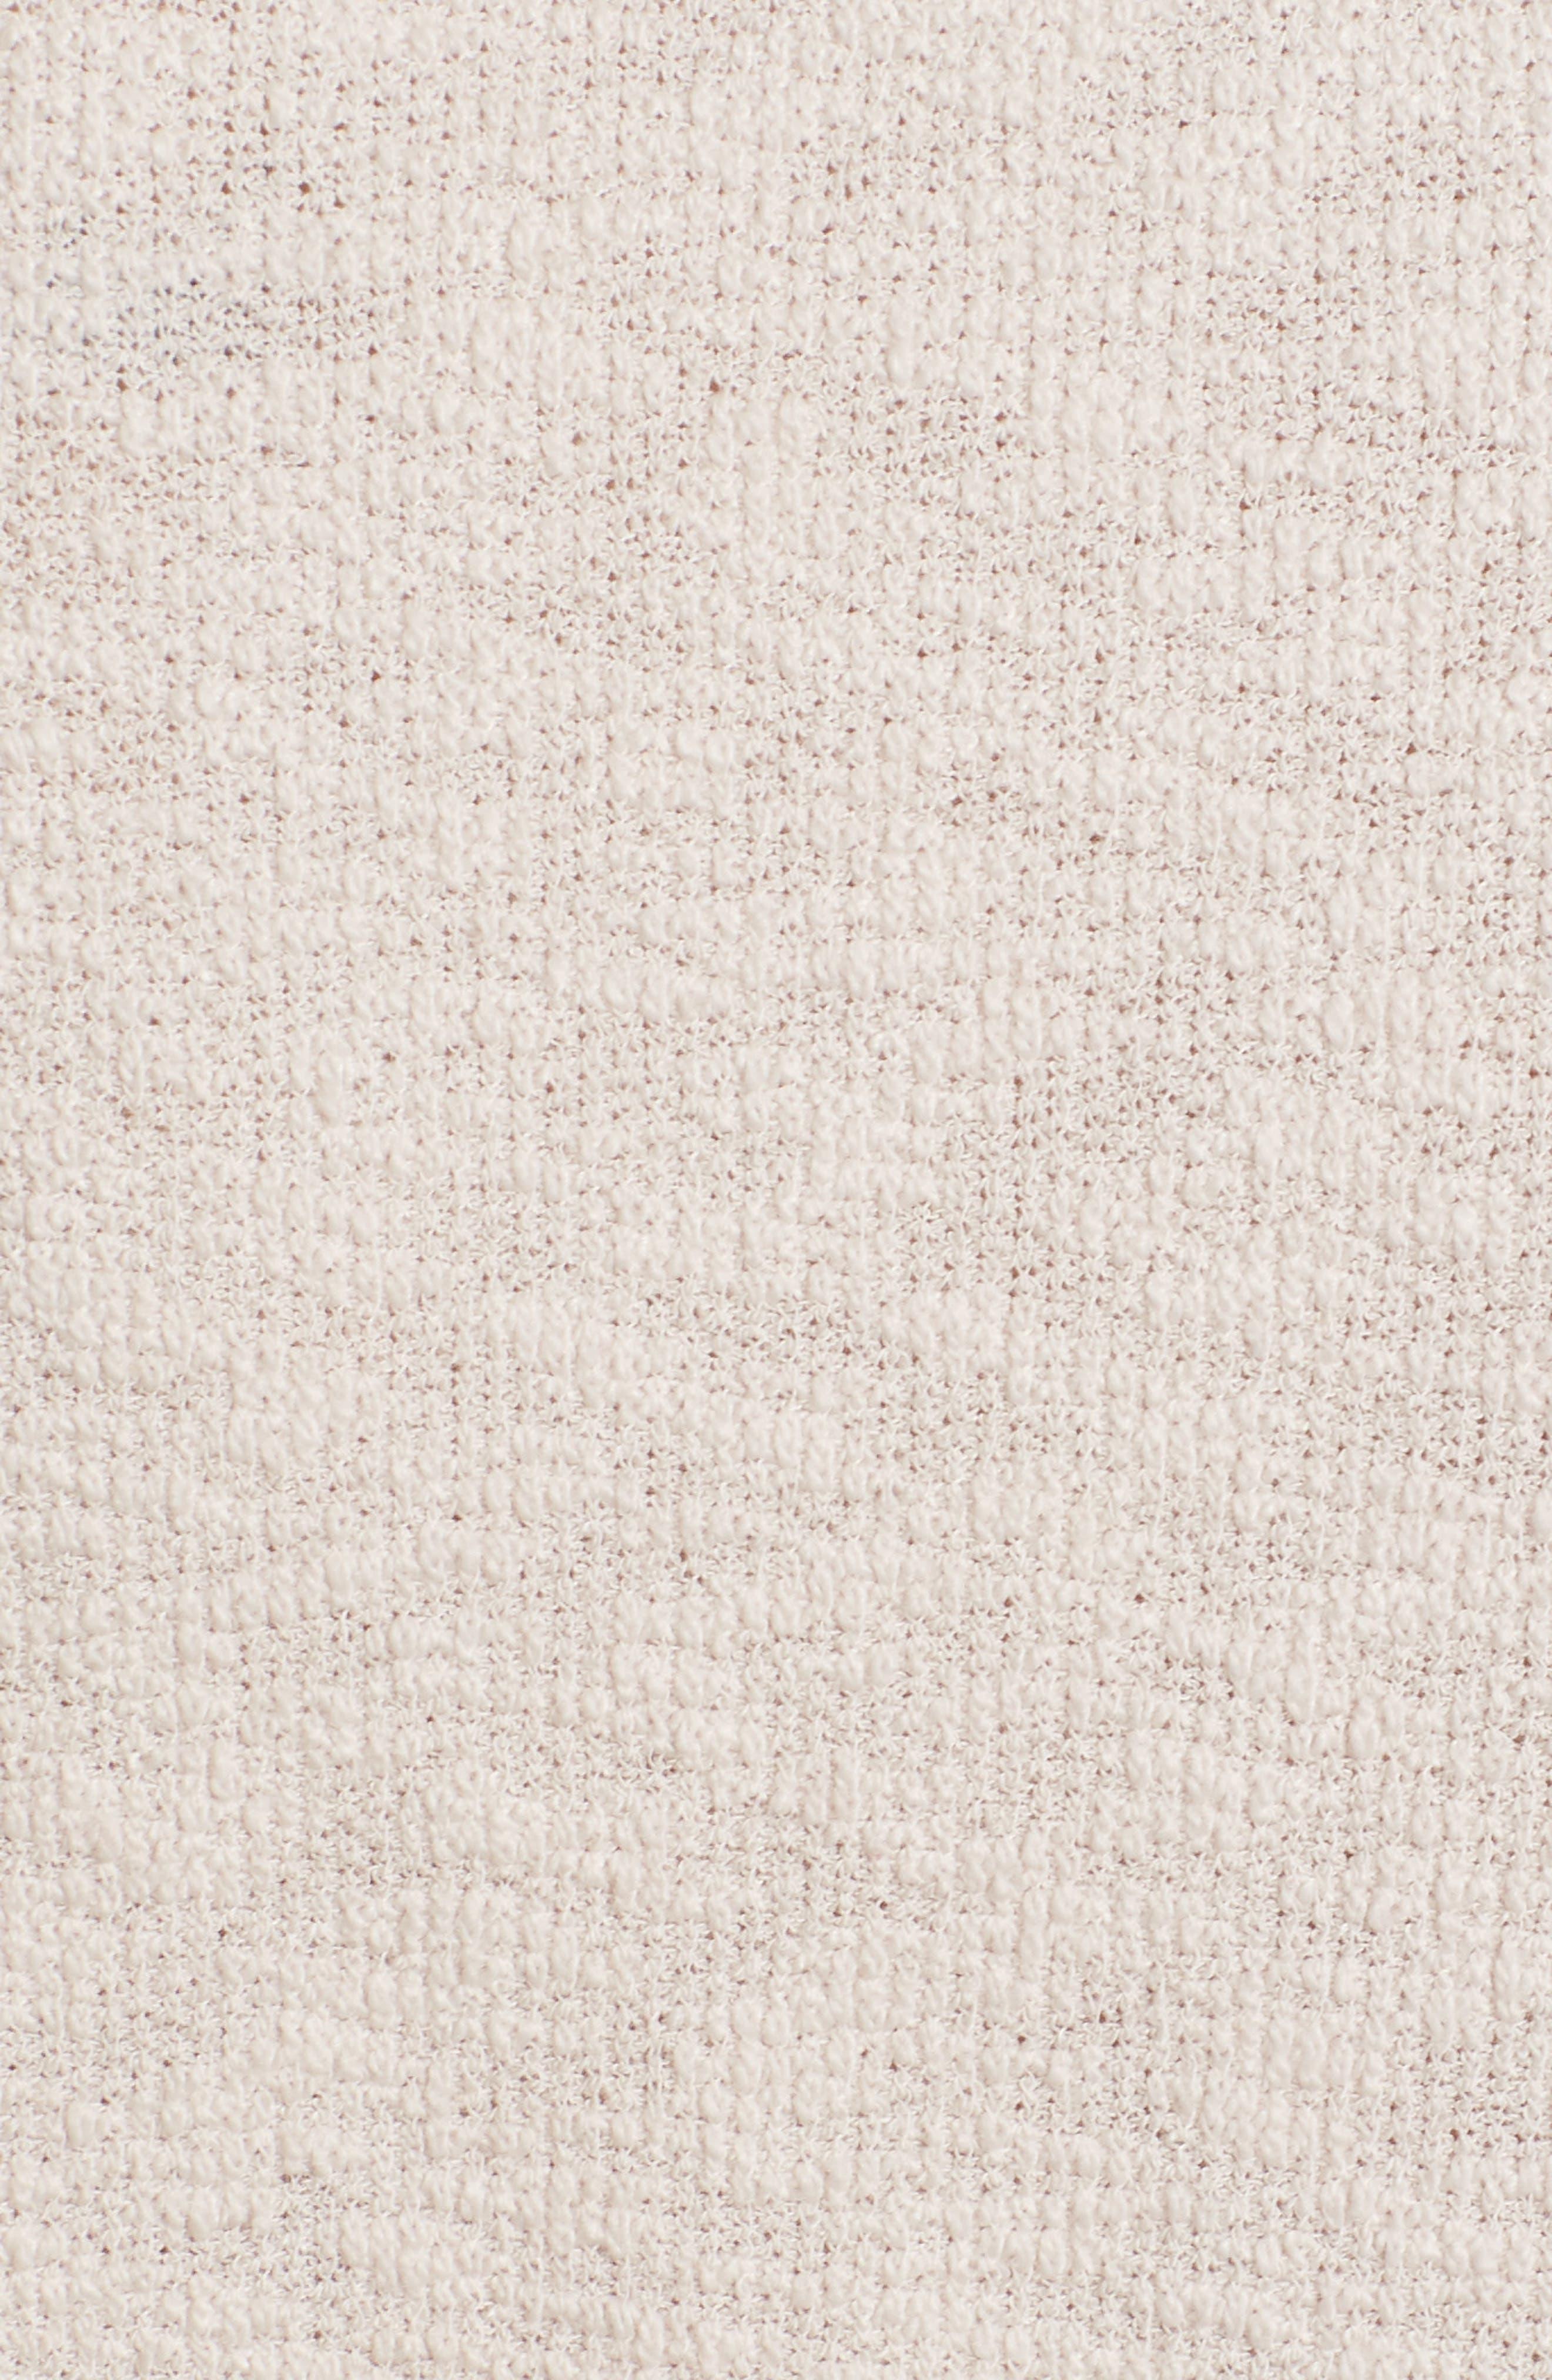 Cherry Blossom Ruffle Sleeve Top,                             Alternate thumbnail 5, color,                             682